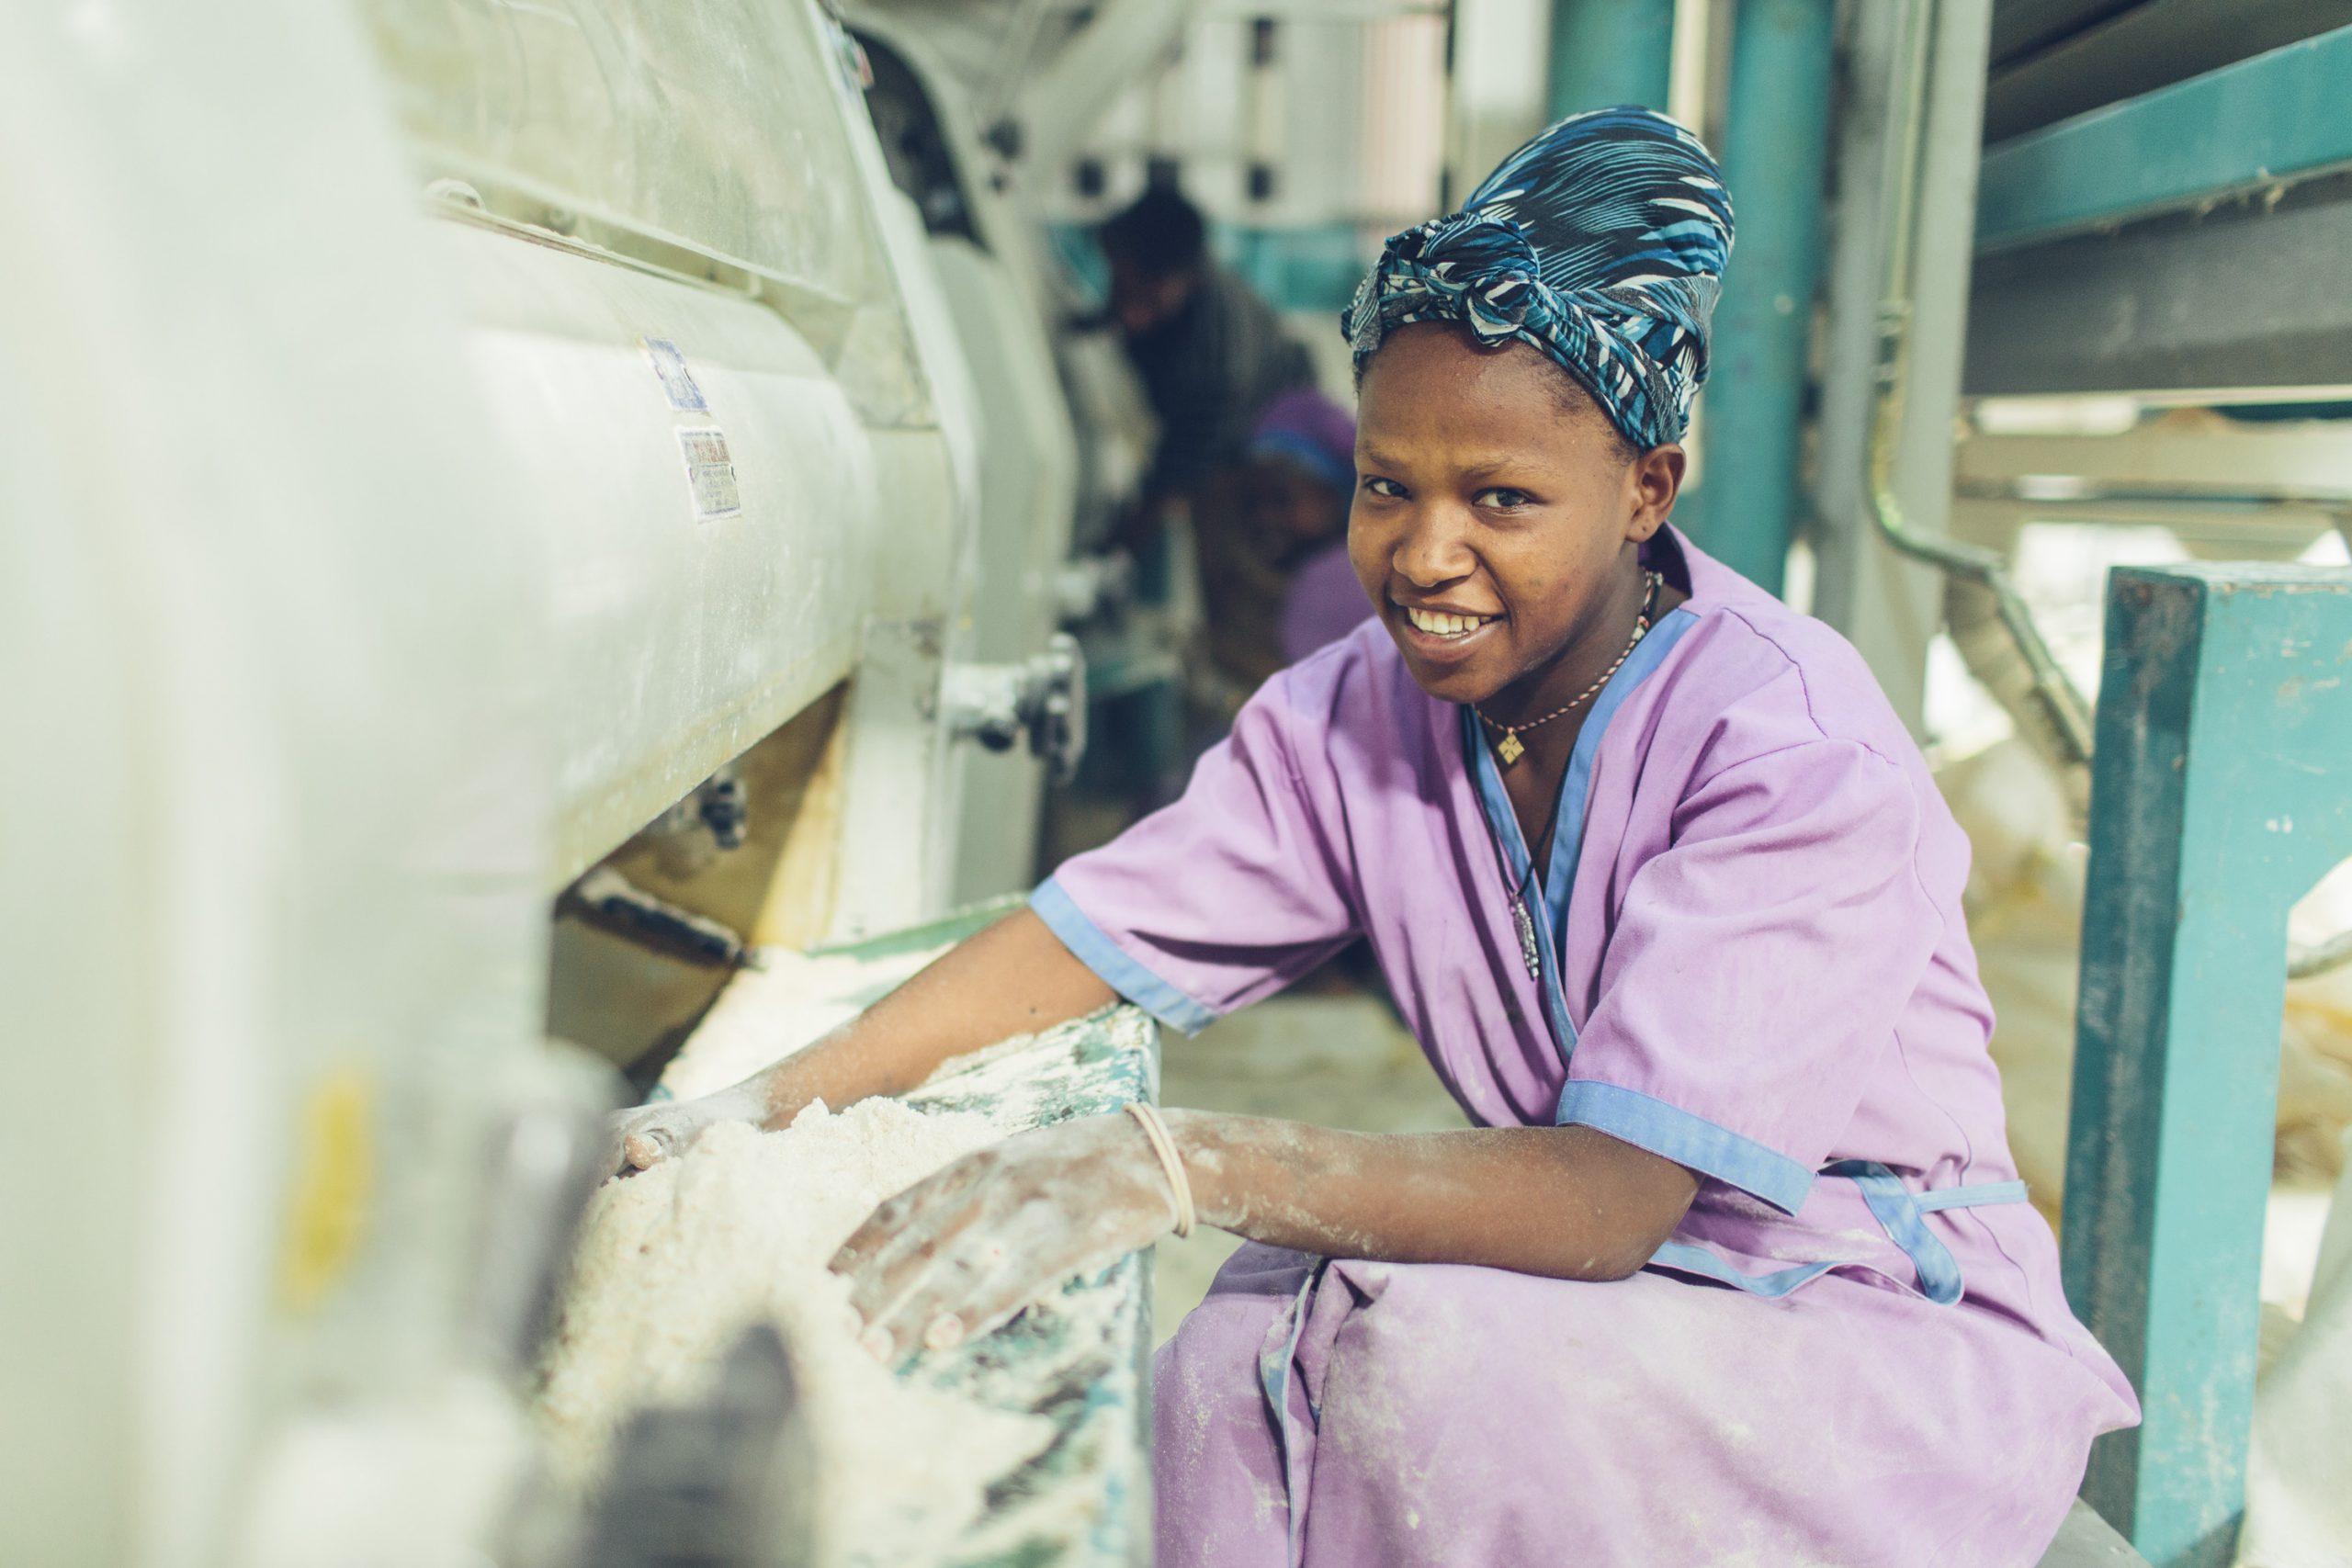 A woman working at a grain mill in Sannie, Ethiopia